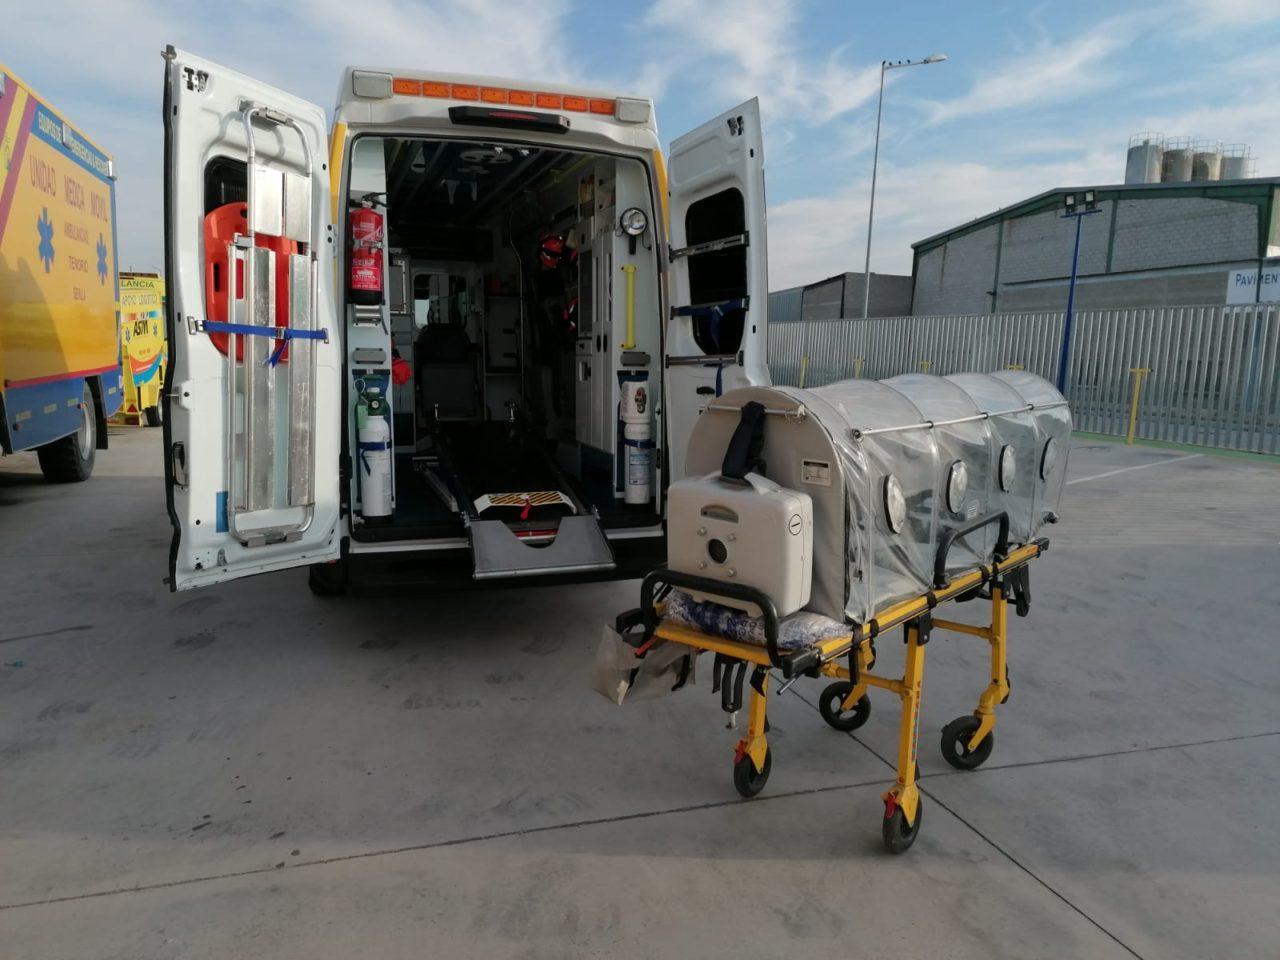 https://ambulancias-malaga.com/wp-content/uploads/2020/04/NOTICIA-4-1280x960.jpg